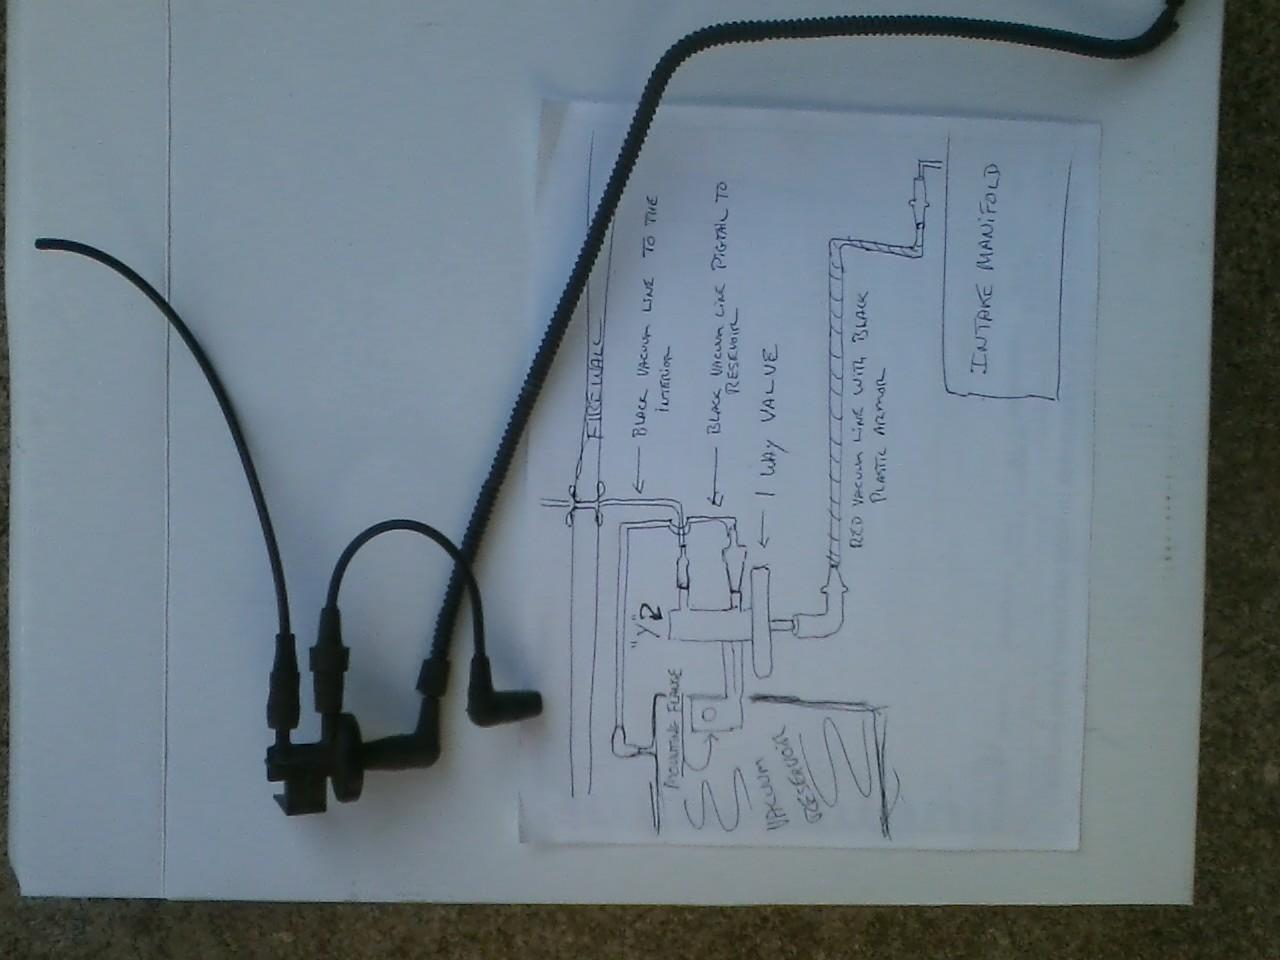 2003 ford windstar vacuum hose diagram atv winch rocker switch wiring gm y harness connectors auto